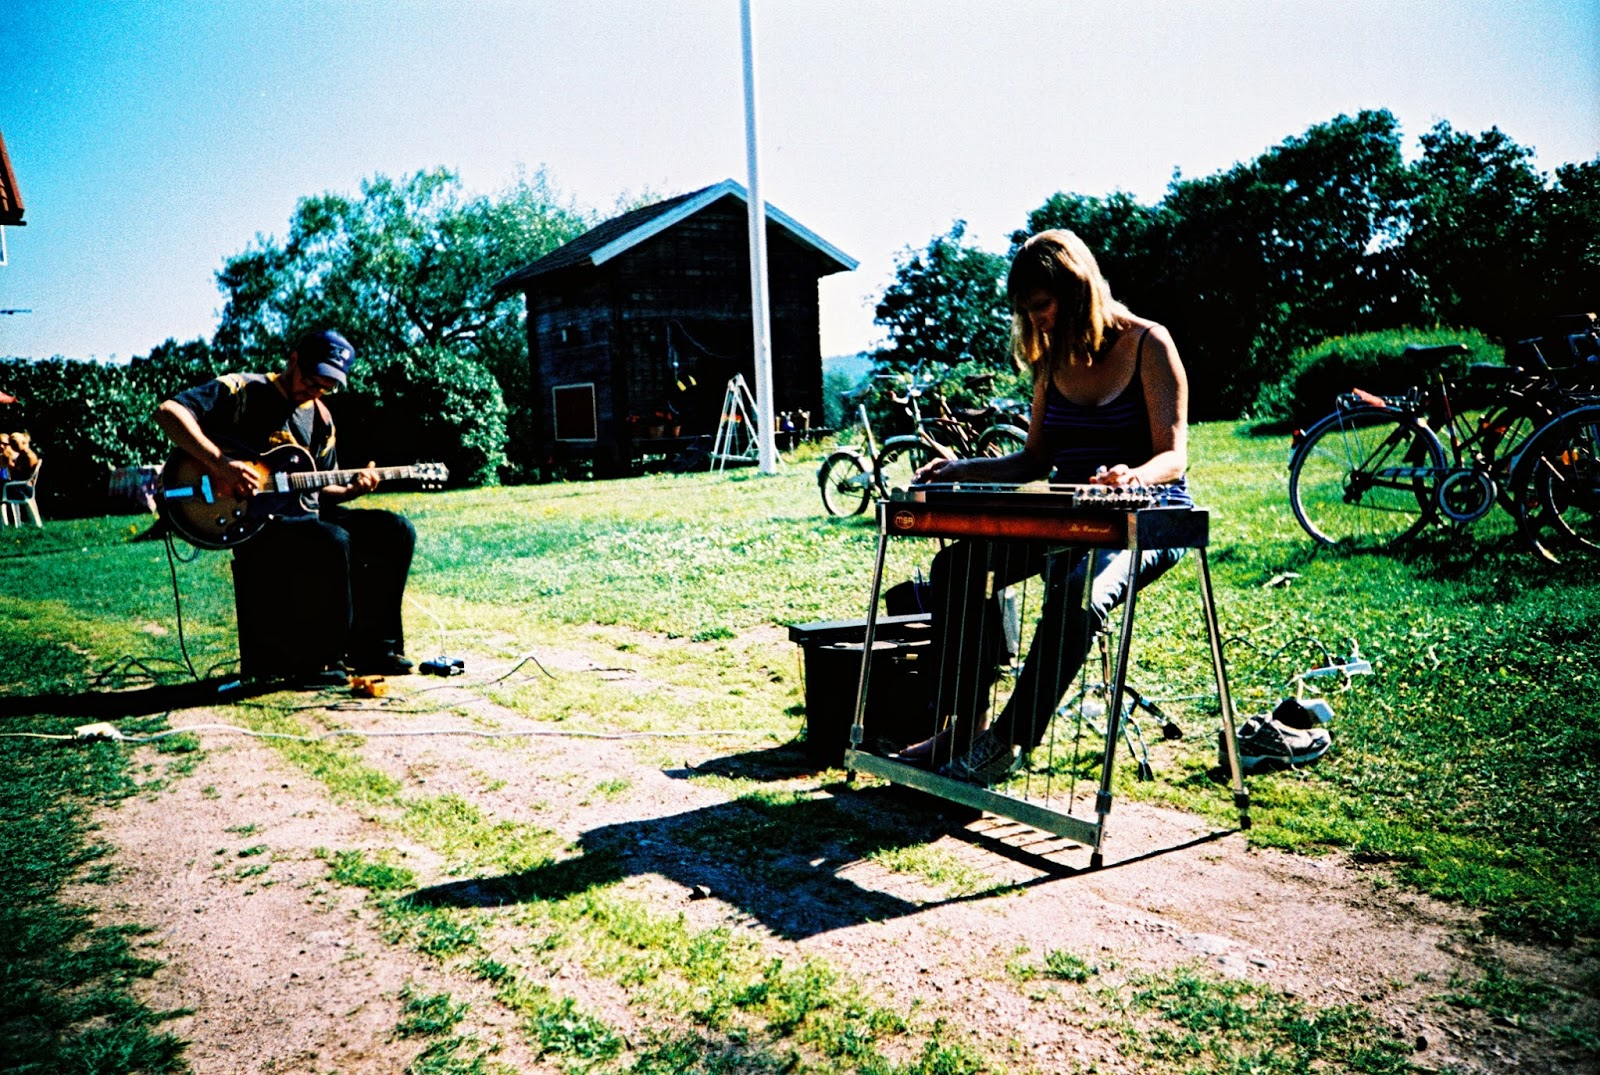 Blake-Plock and Susan Alcorn. Dala-Floda, Sweden. Hagenfesten 2006.